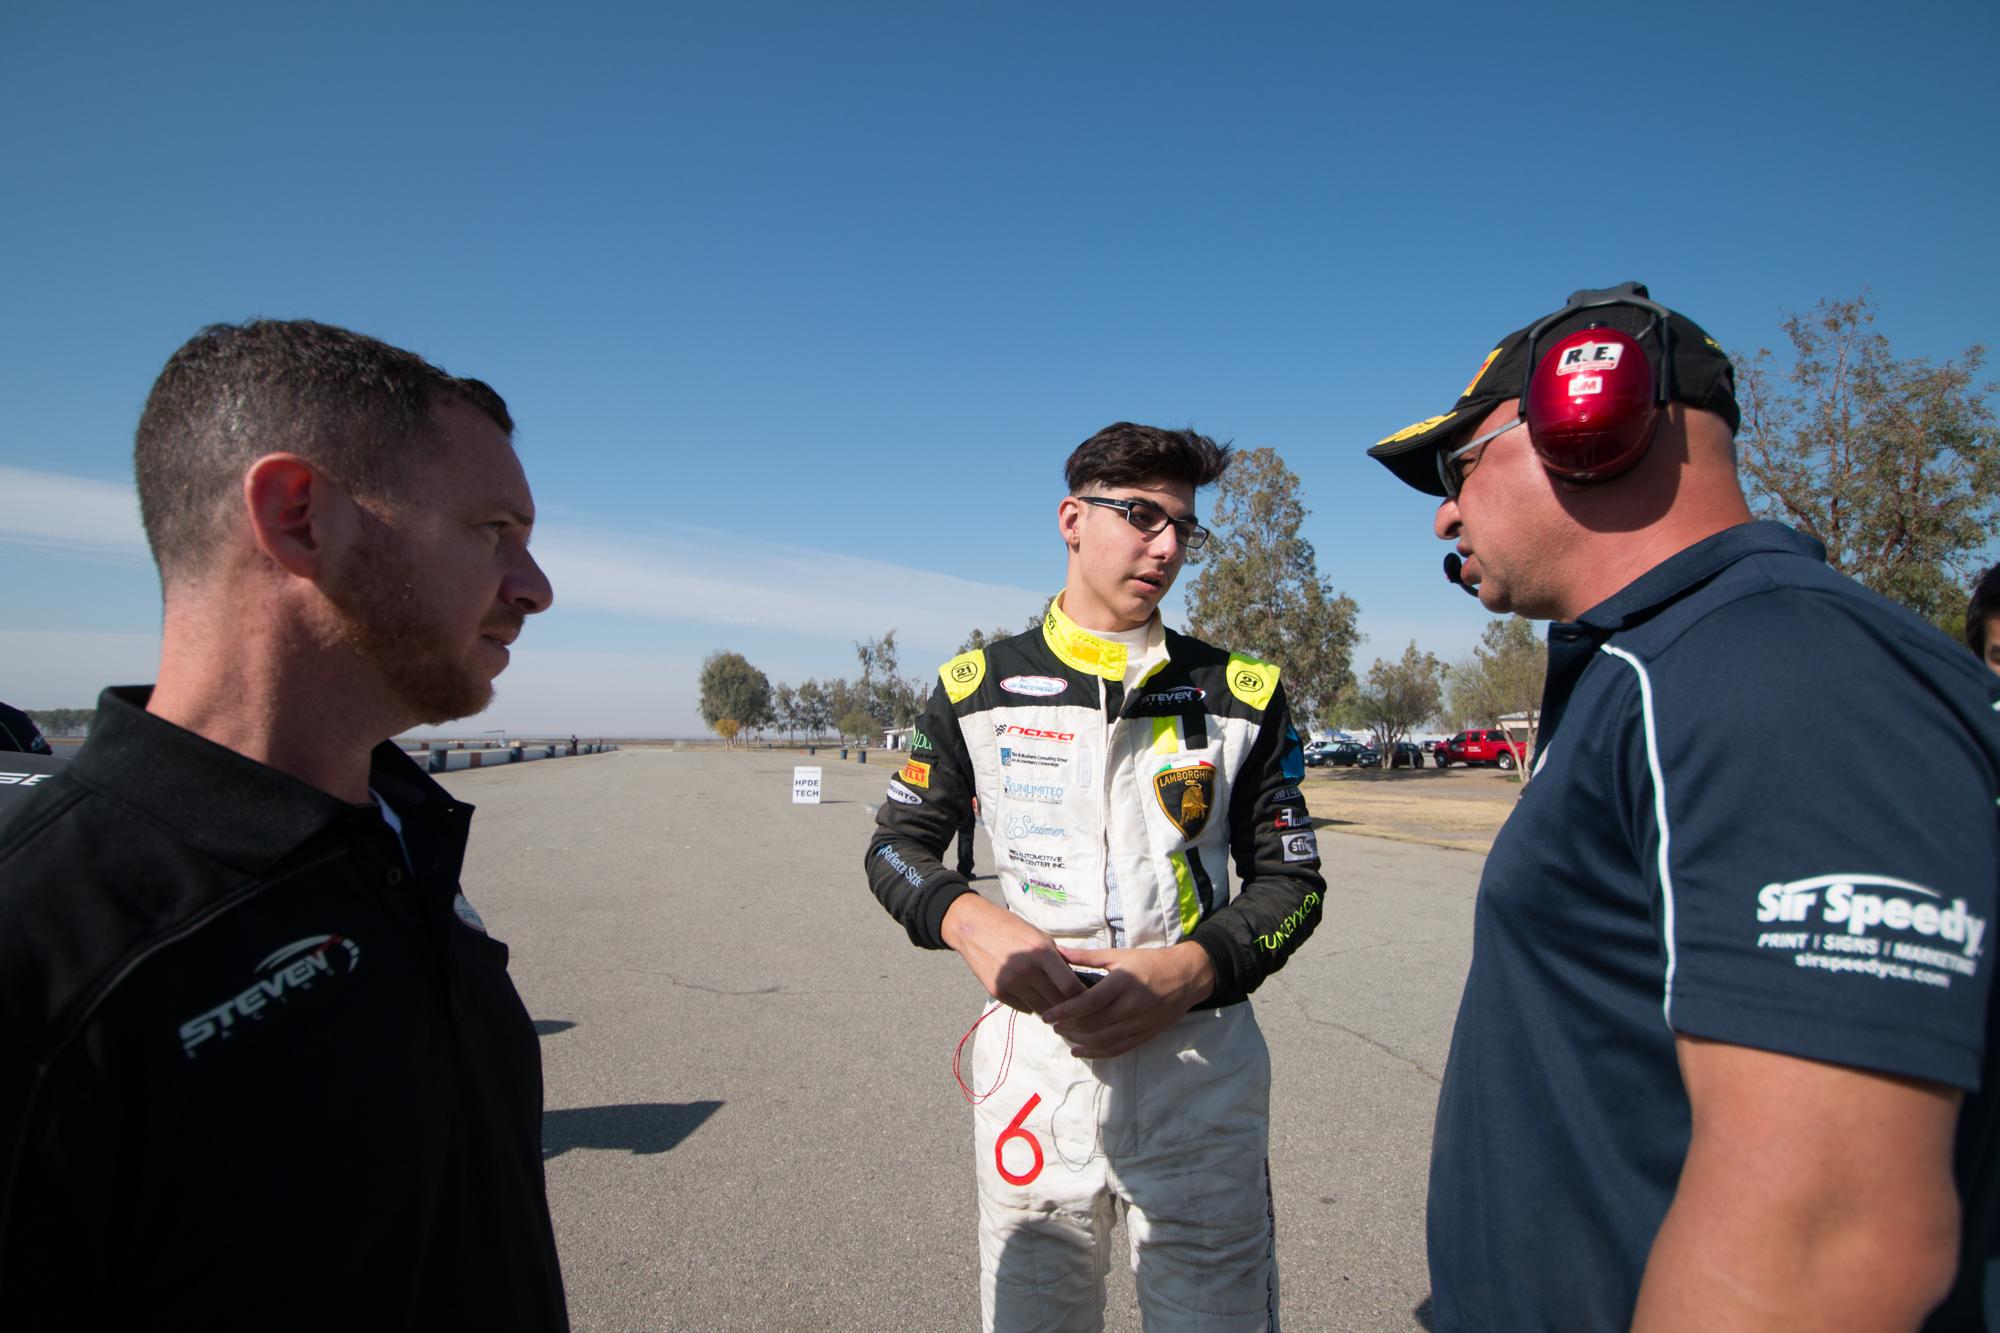 Steven-Racing-20130228-55414.jpg